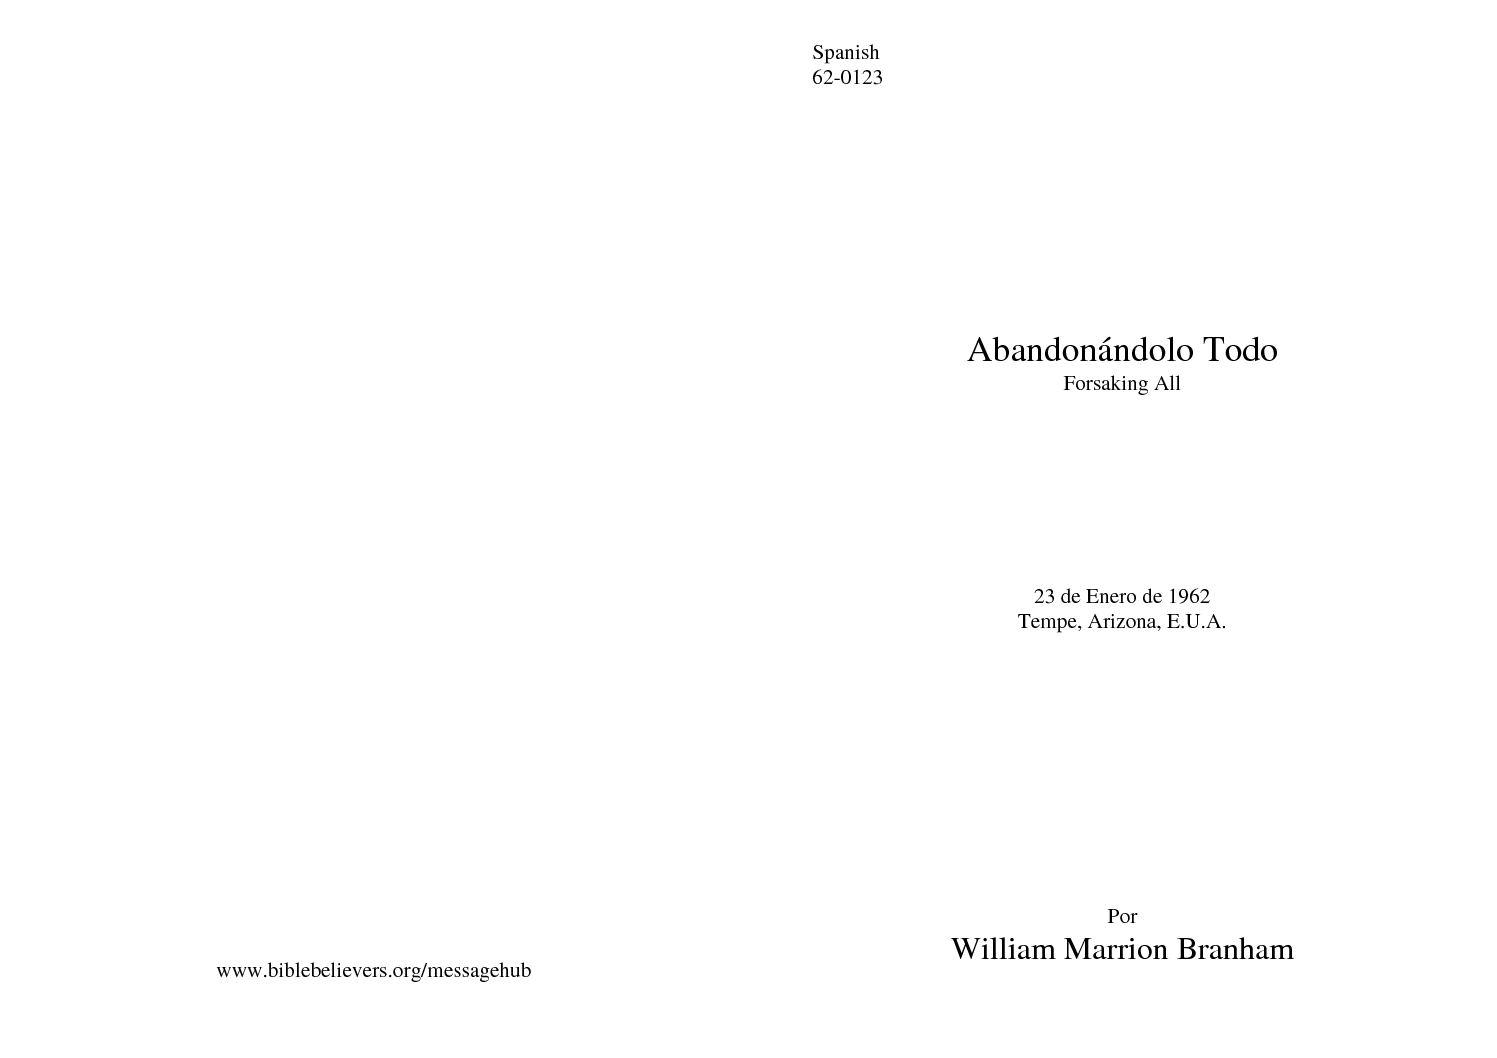 62-0123 TODO ABANDONANDOLO